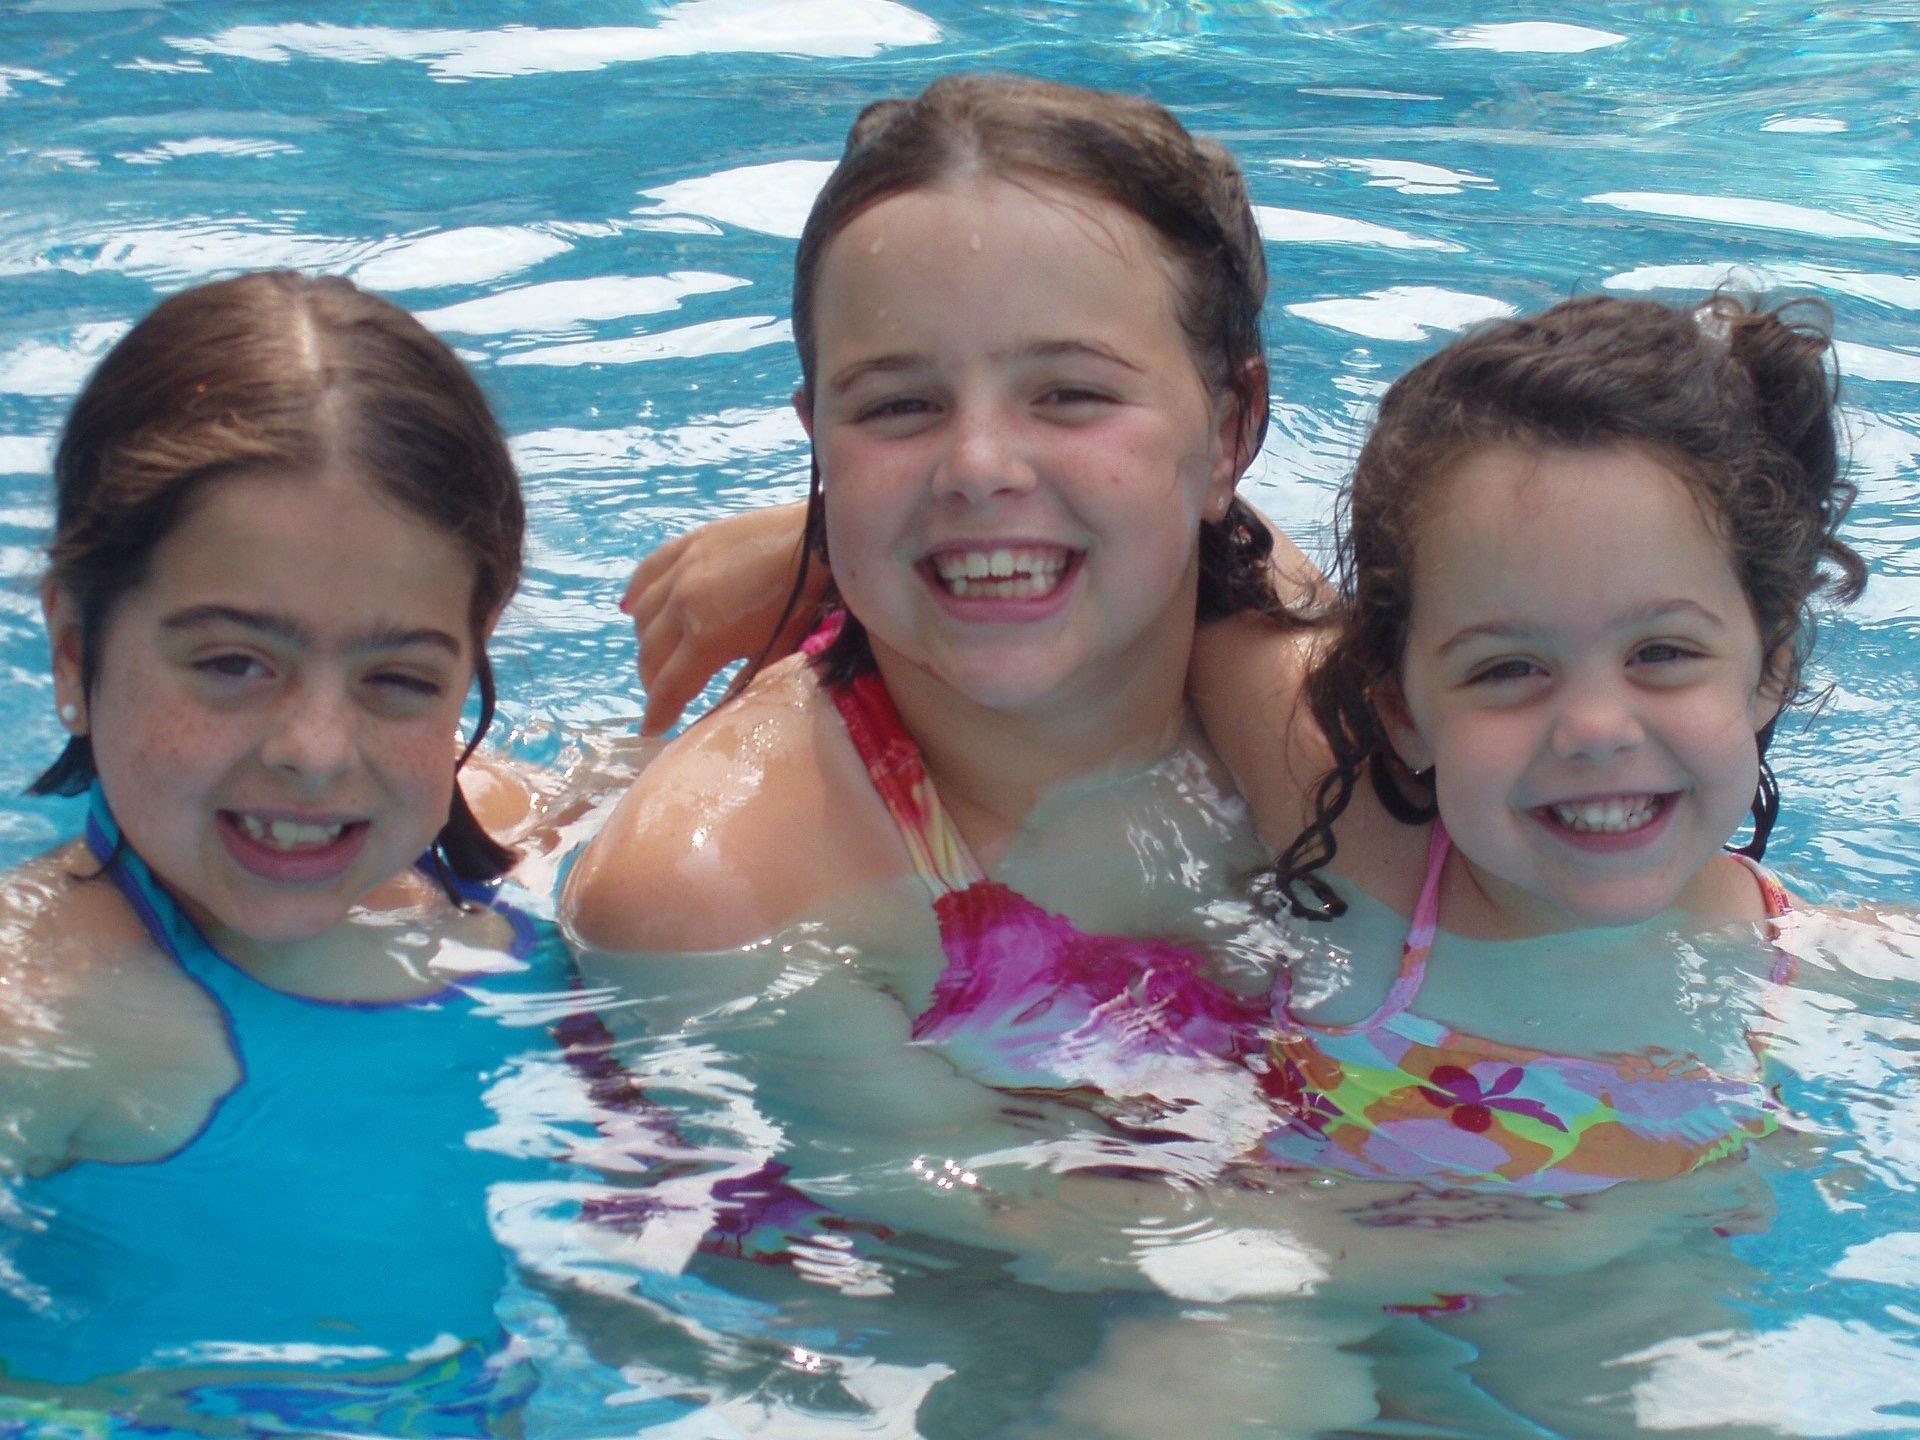 Me, far left, taking swim lessons from Liquid Lifestyles (2003)